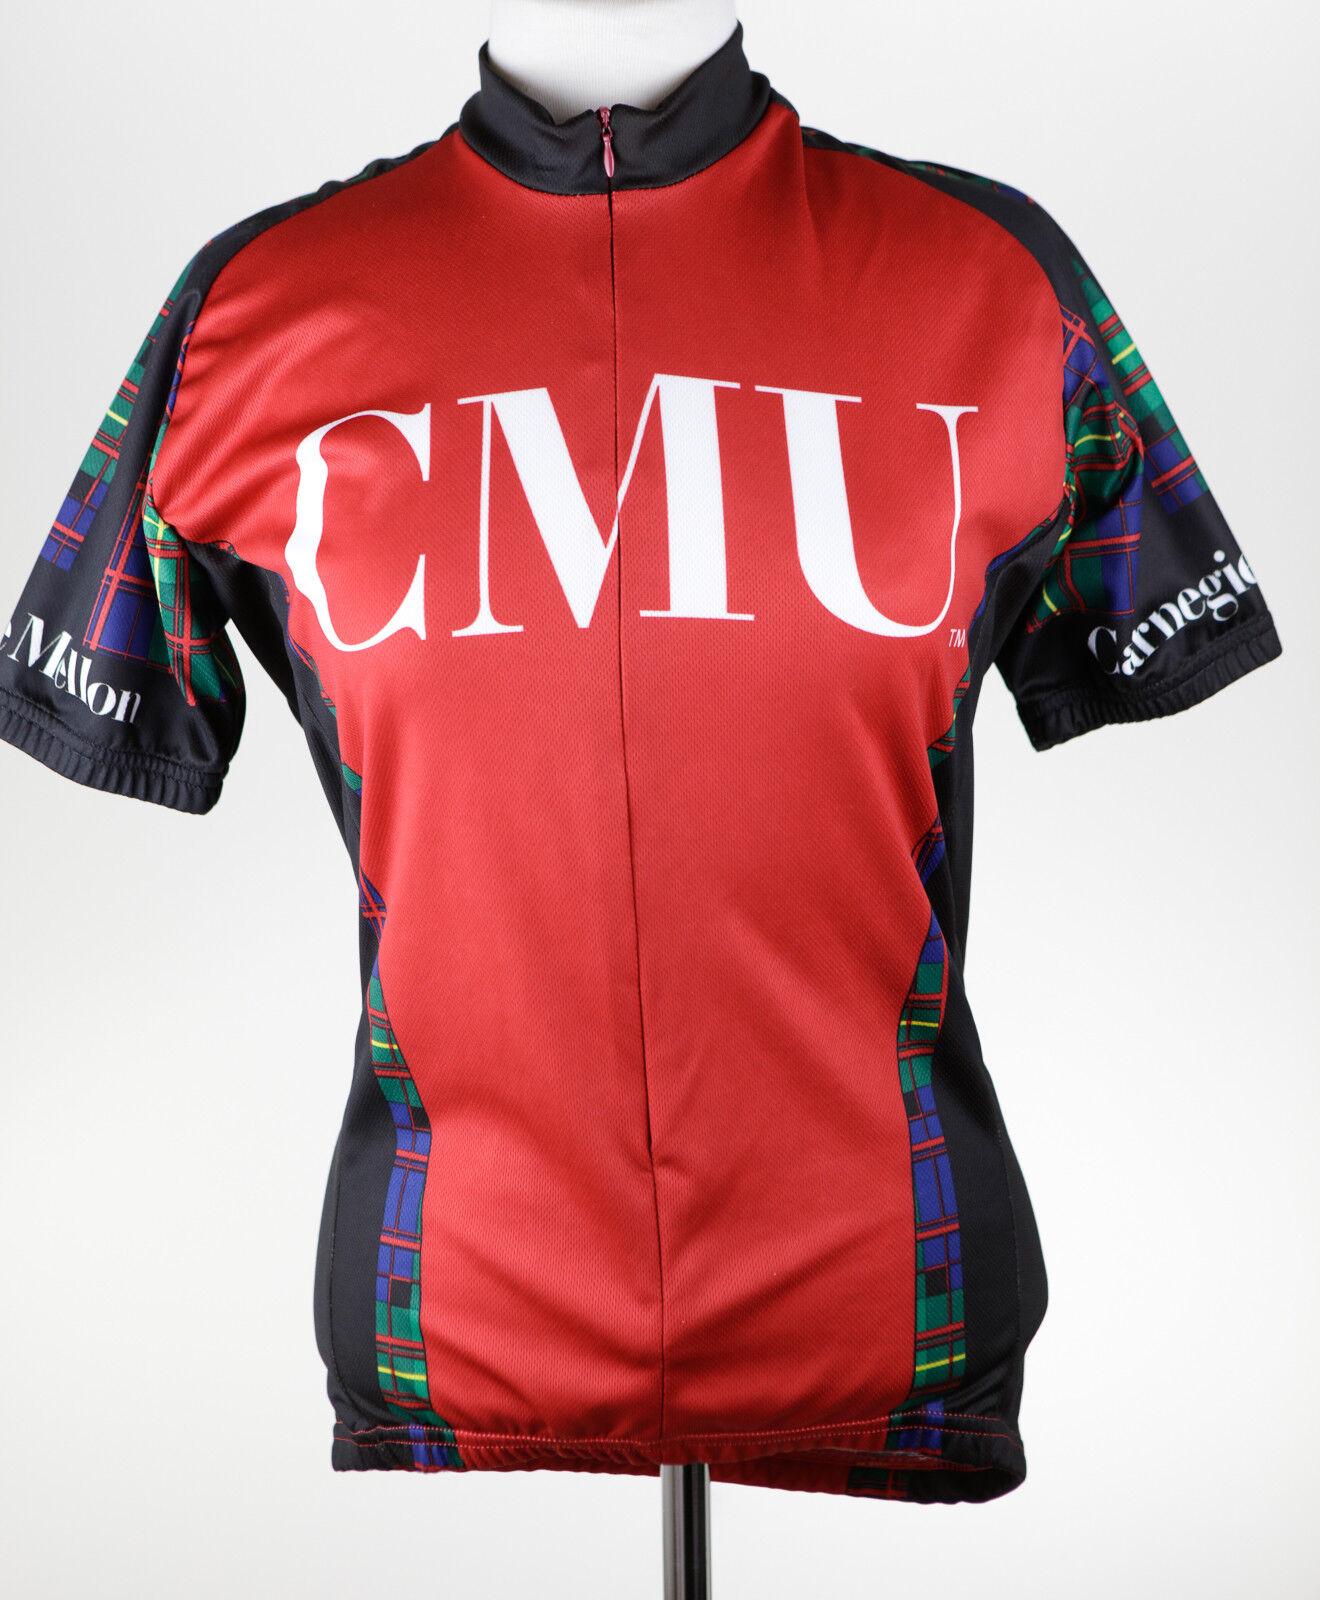 Adrenaline Promotions Men CMU Carnegie Mellon Cycling Jersey Dimensione Small EUC I737